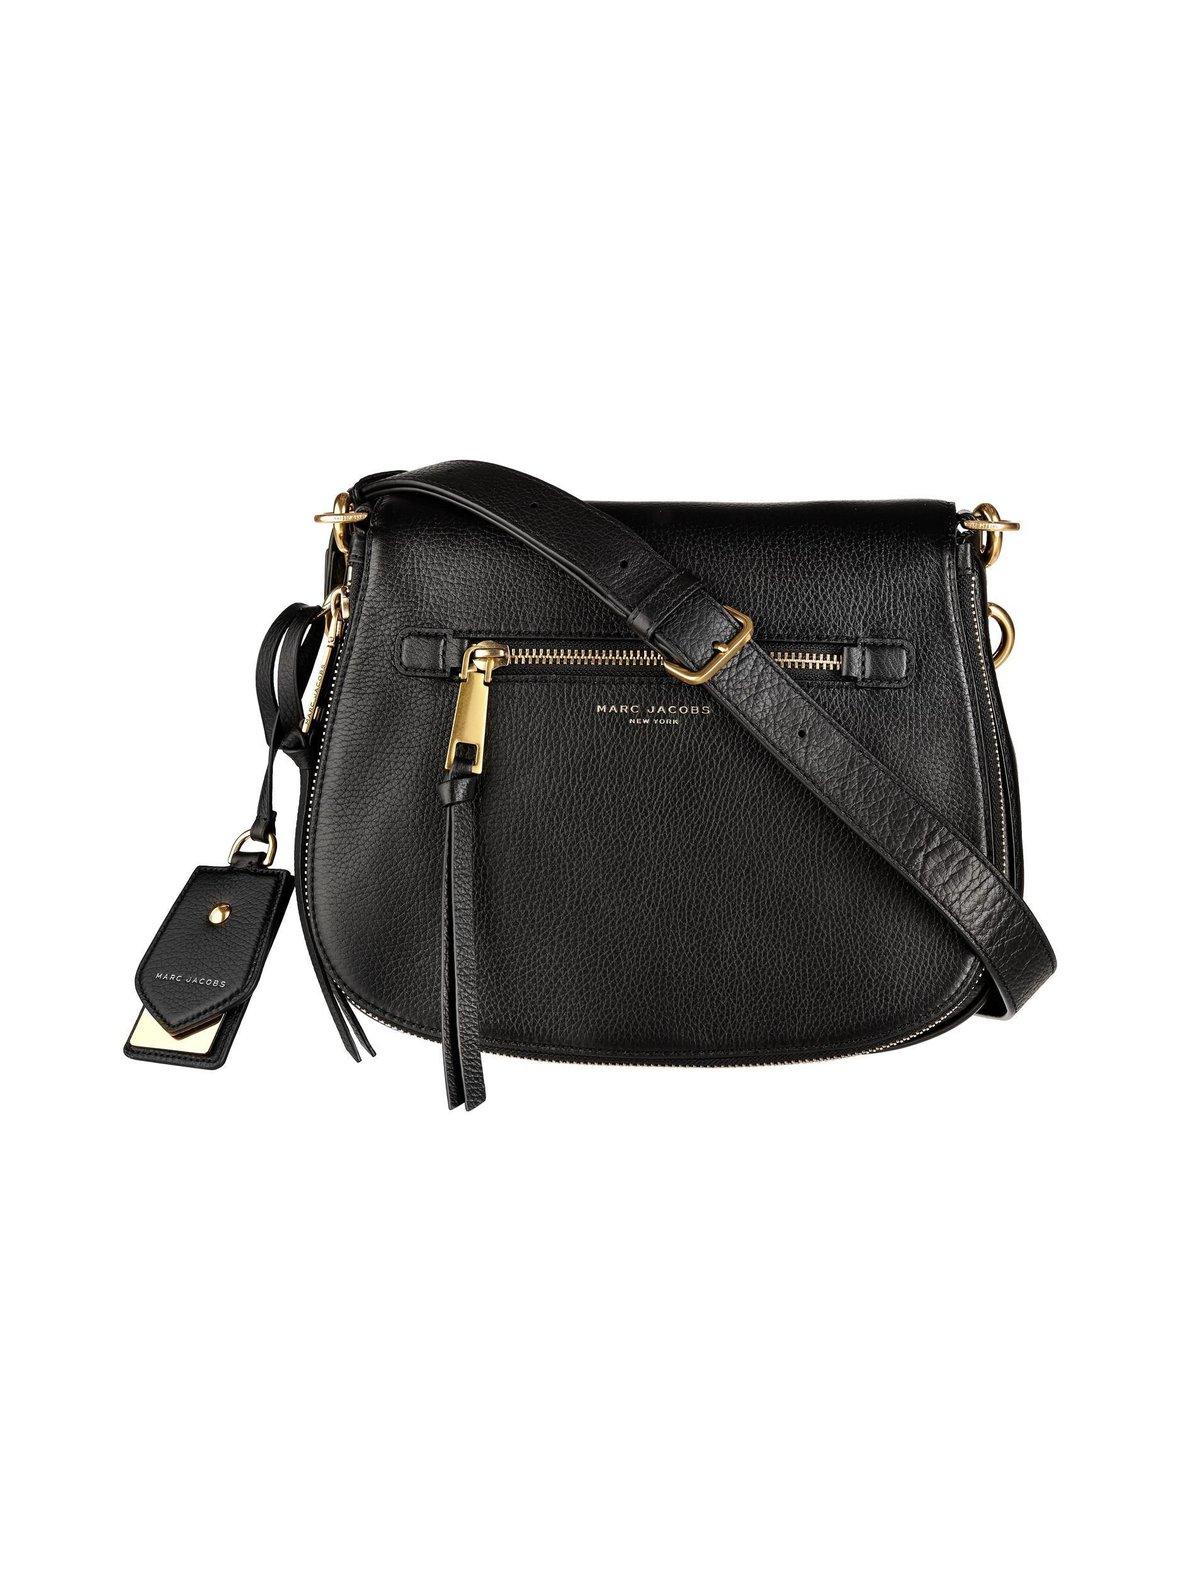 Black (musta) Marc Jacobs M0008102 Recruit Nomad Saddle Bag ... c279e46d85